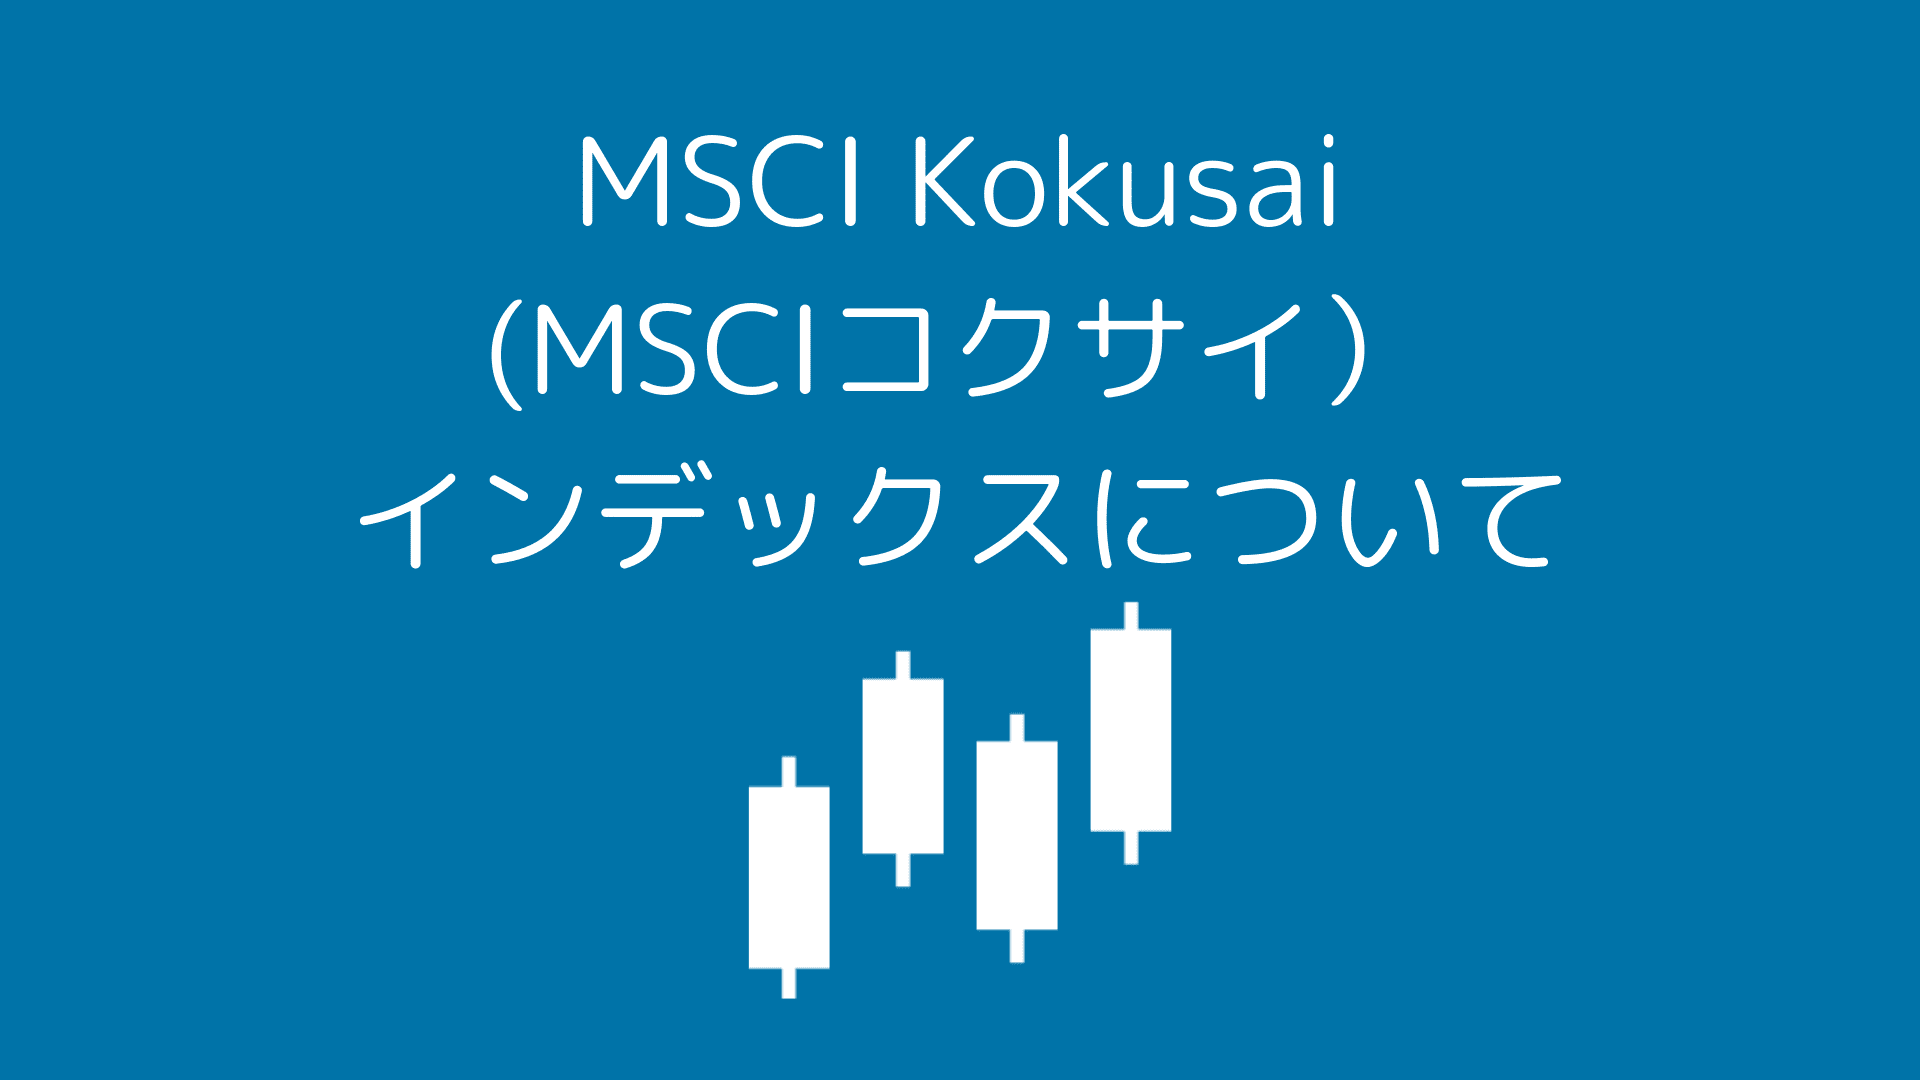 MSCI Kokusai インデックスについて